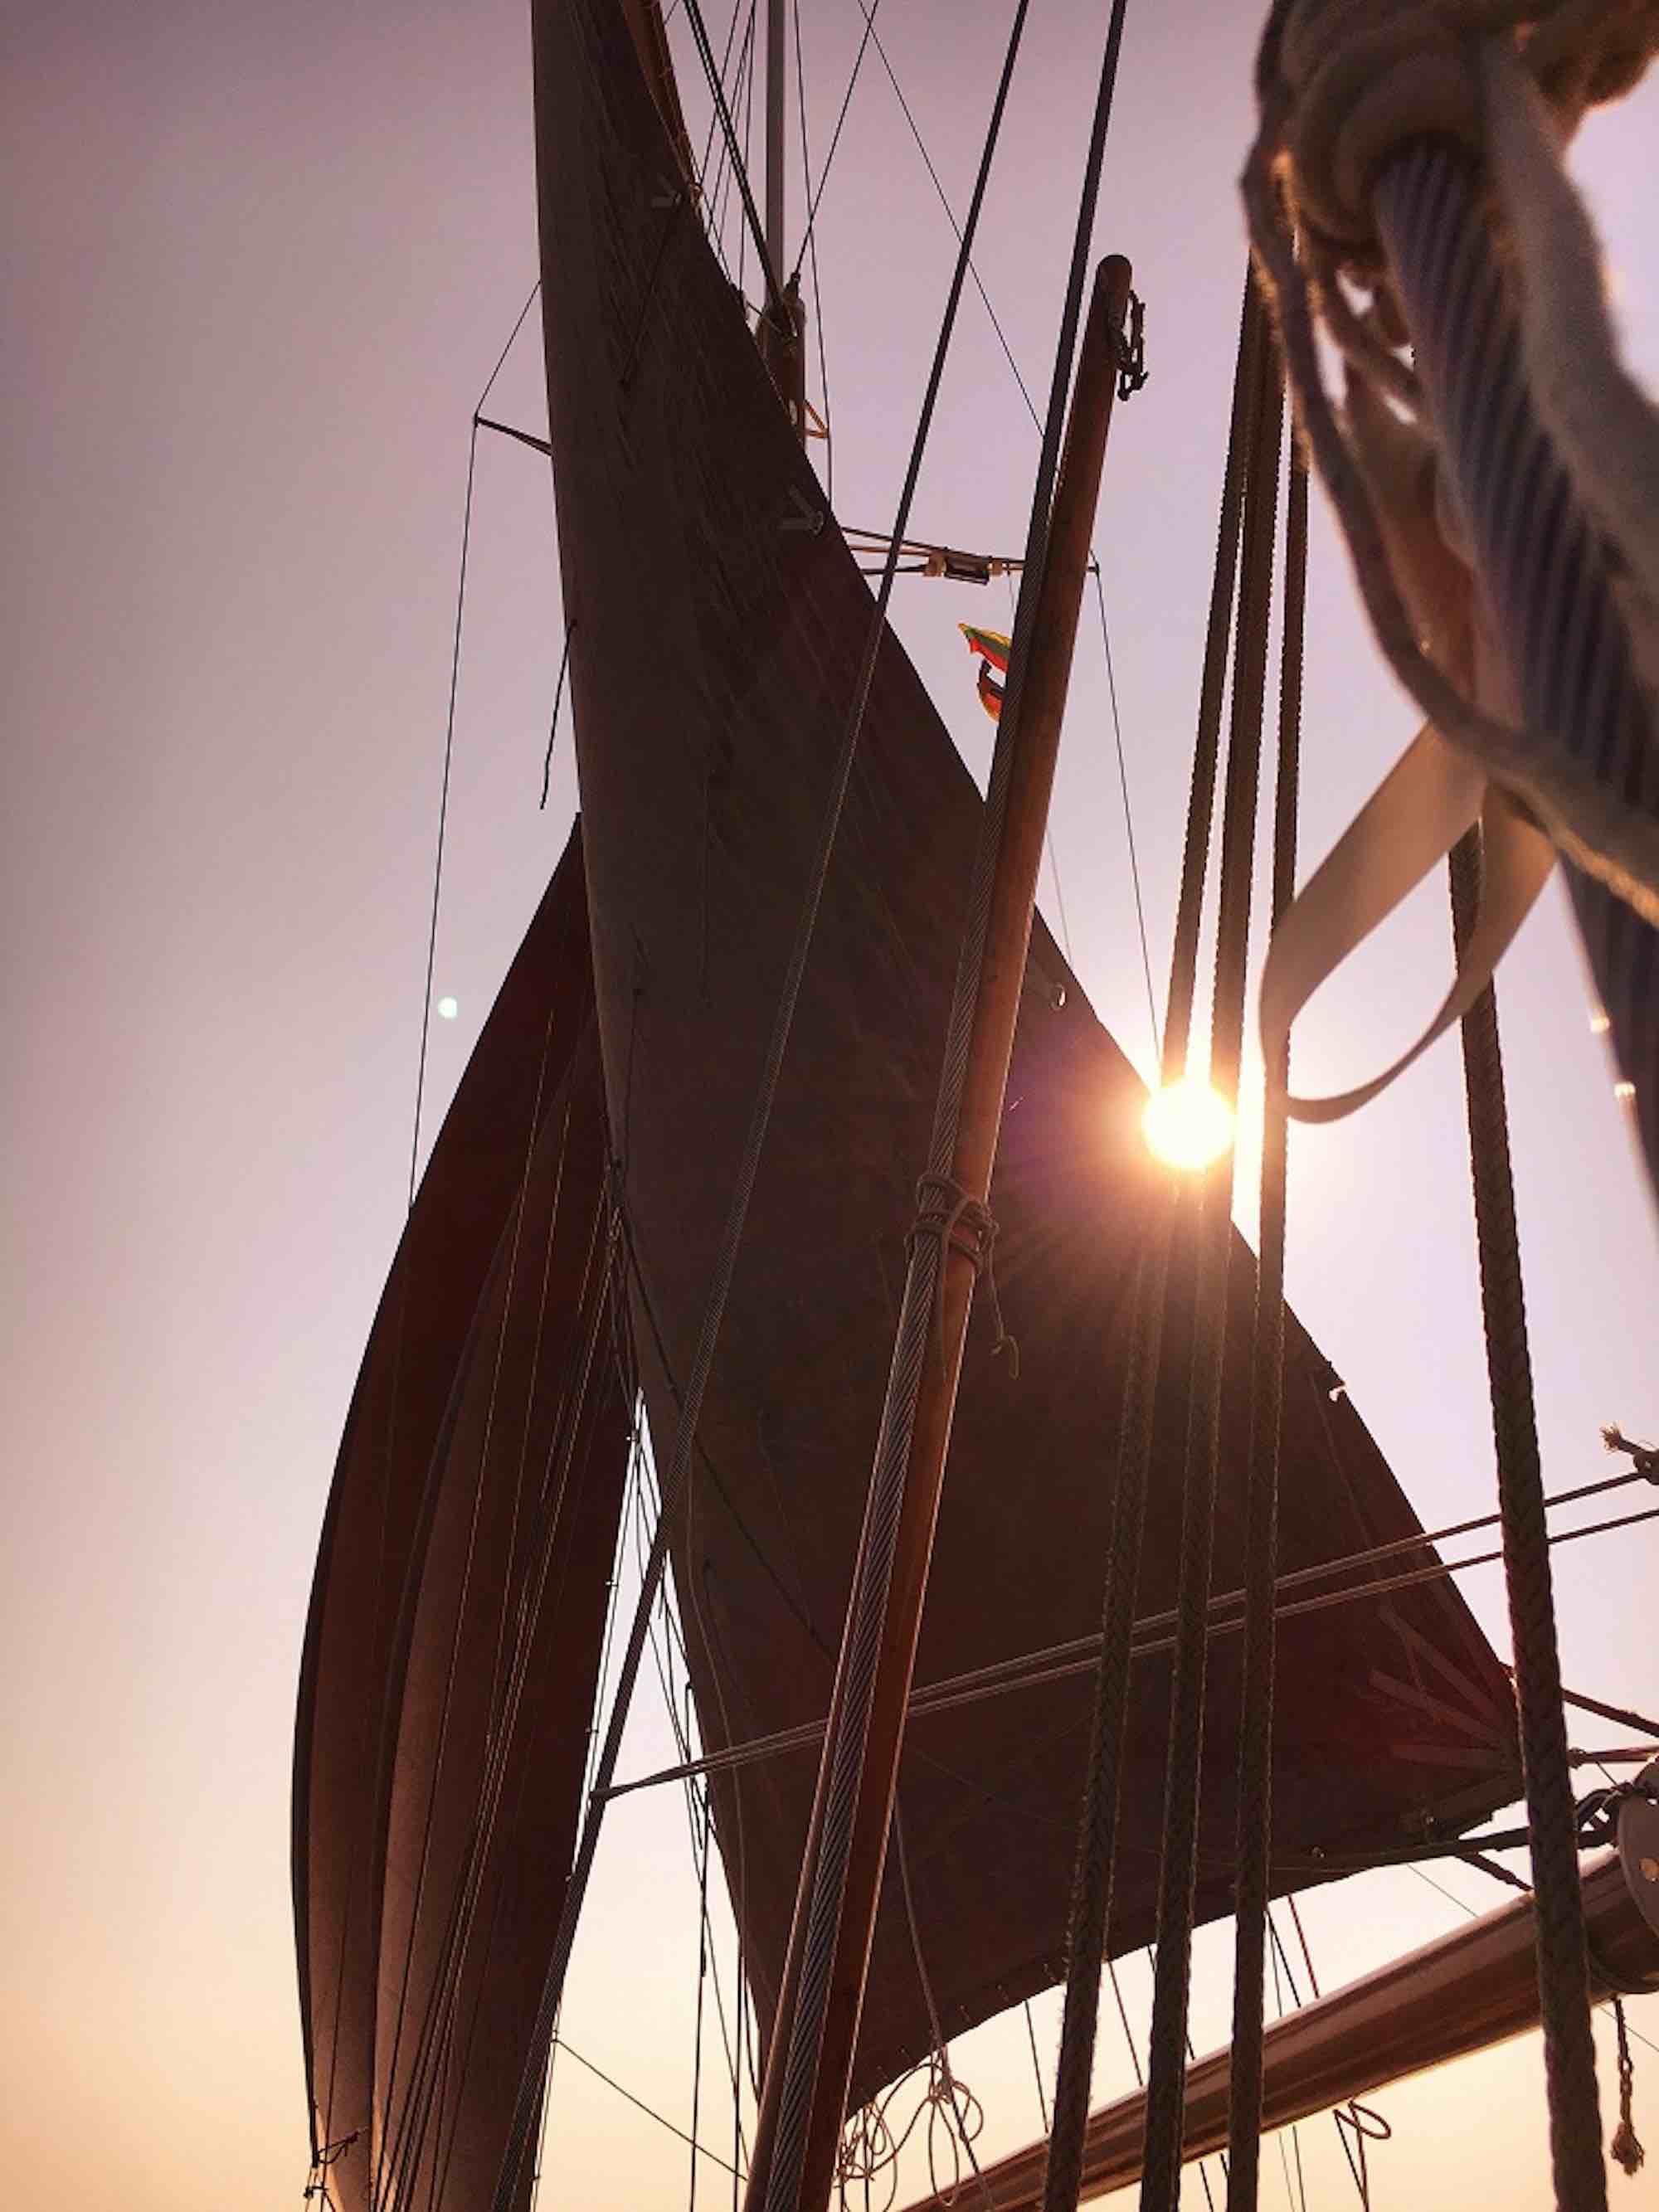 Dallinghoo_sun setting on sail yacht holiday in Mergui_XS.jpeg